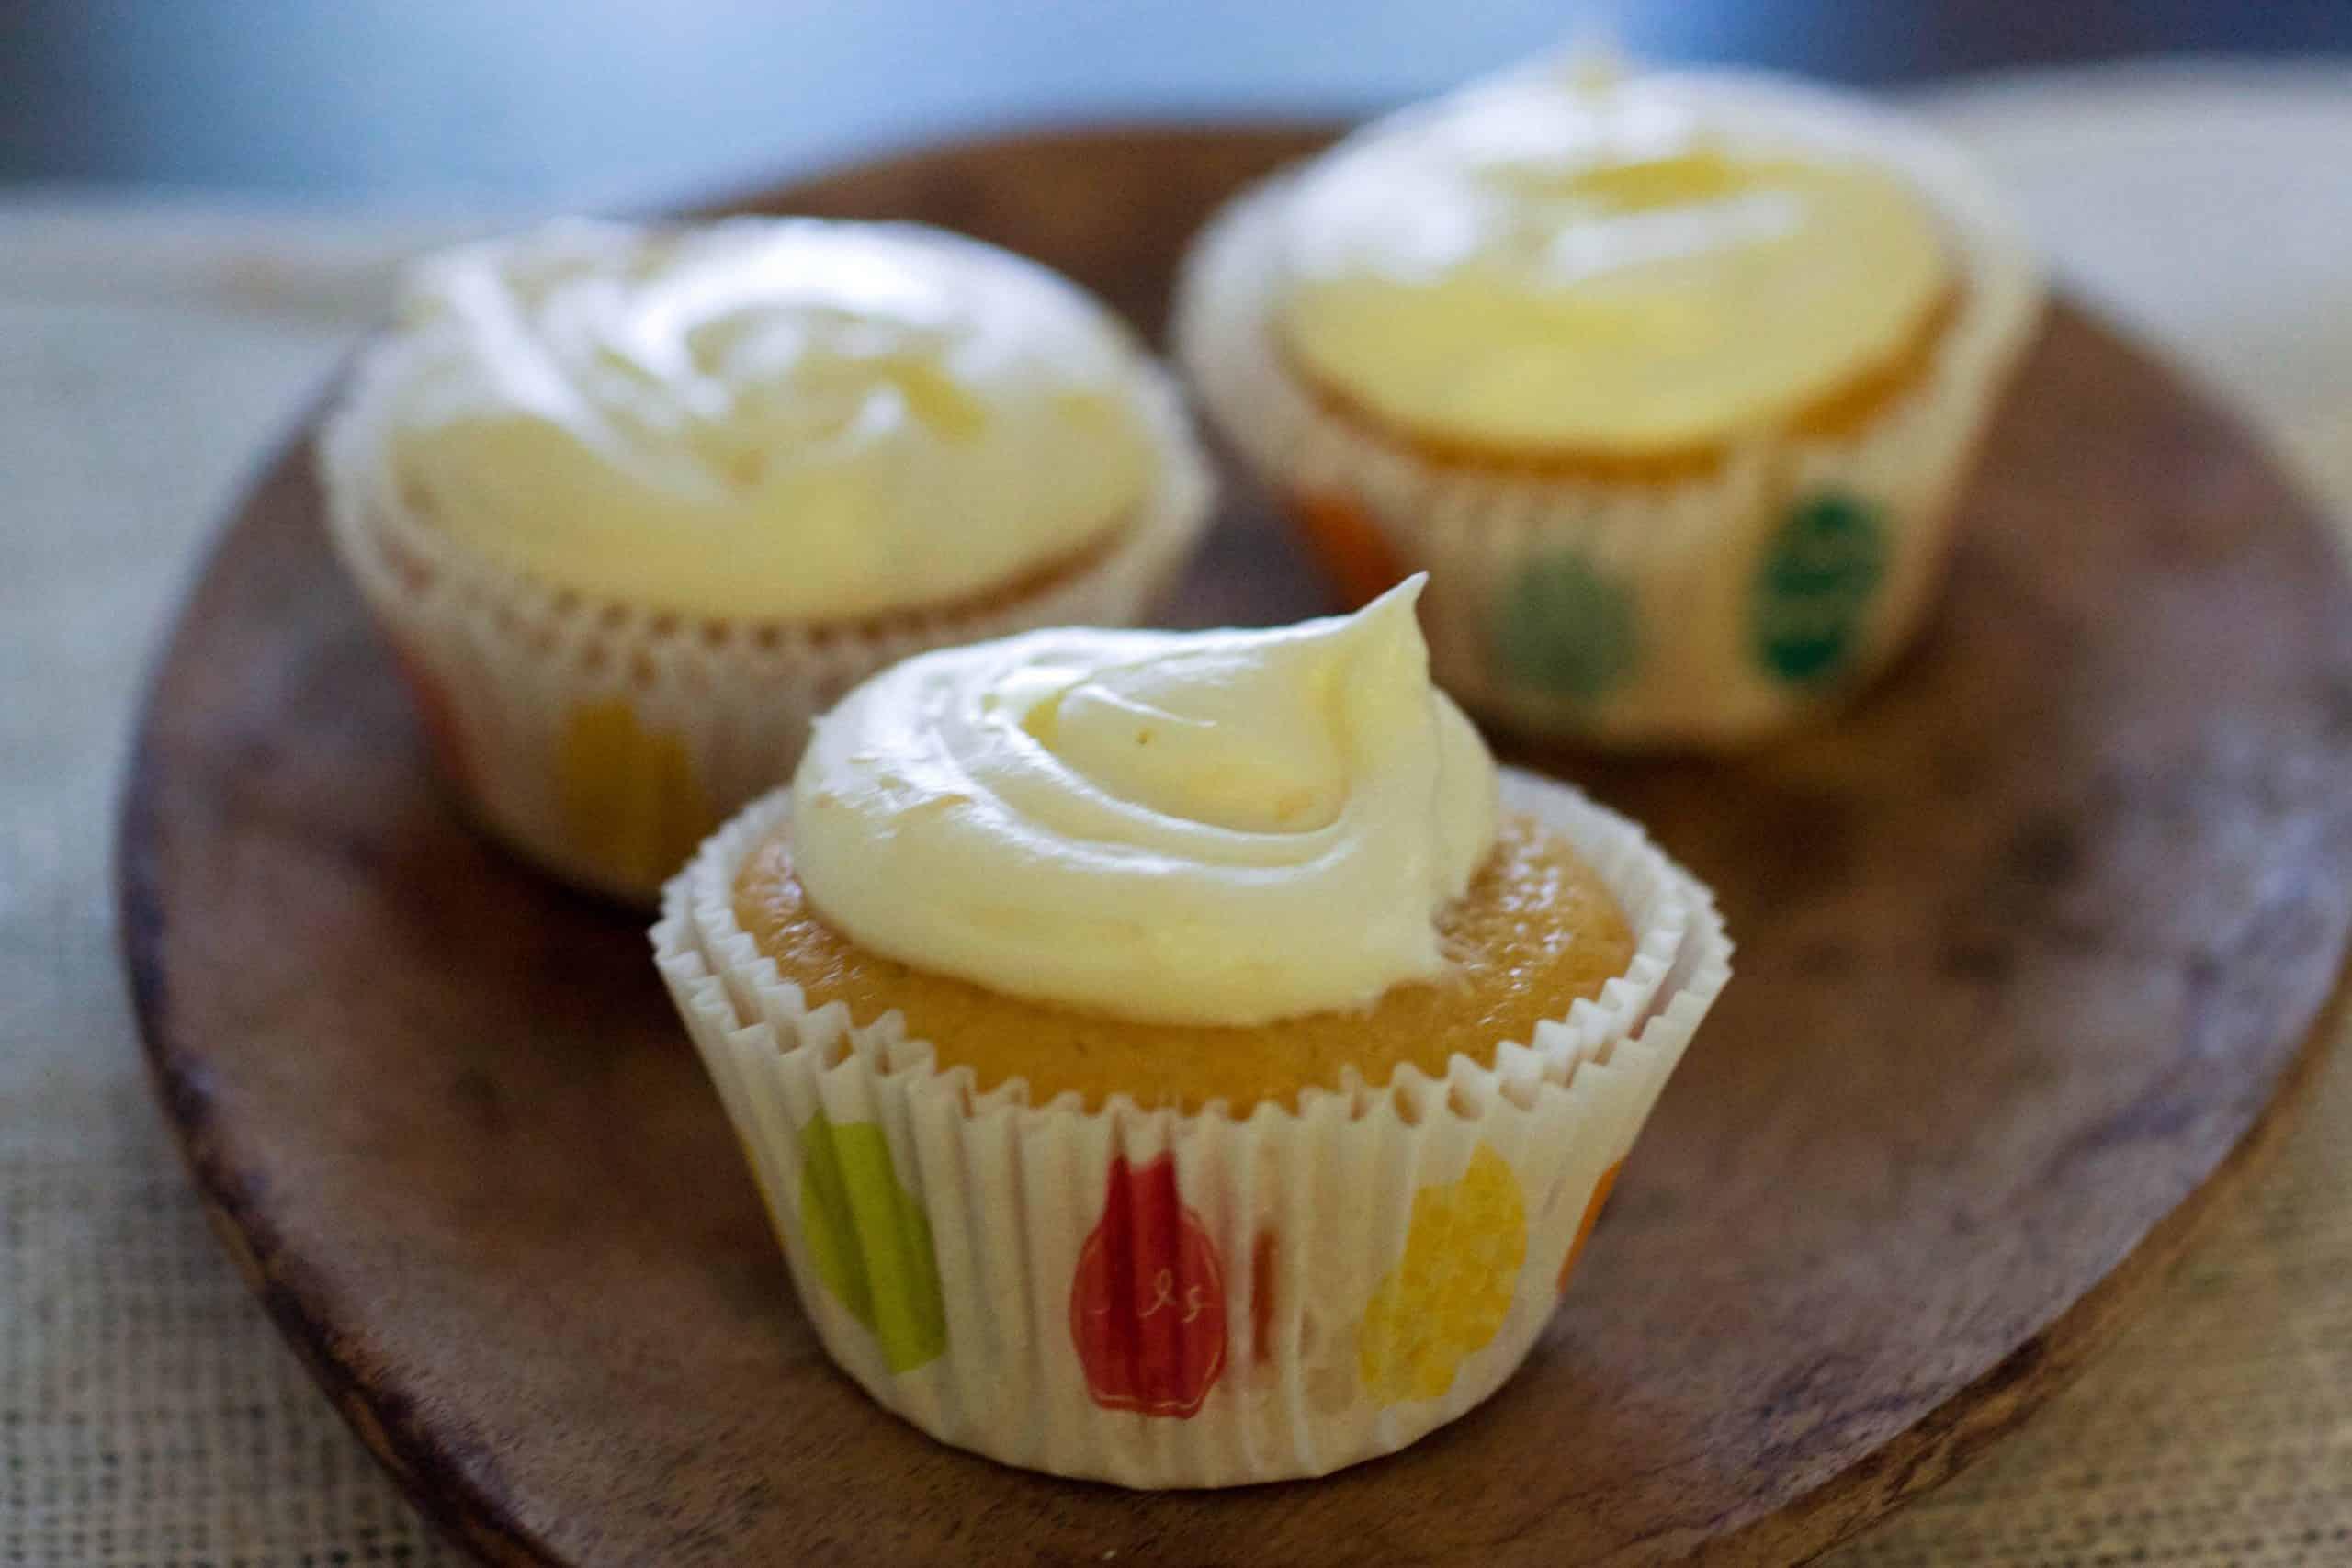 Honey Grapefruit Cupcakes with Honey Buttercream Frosting